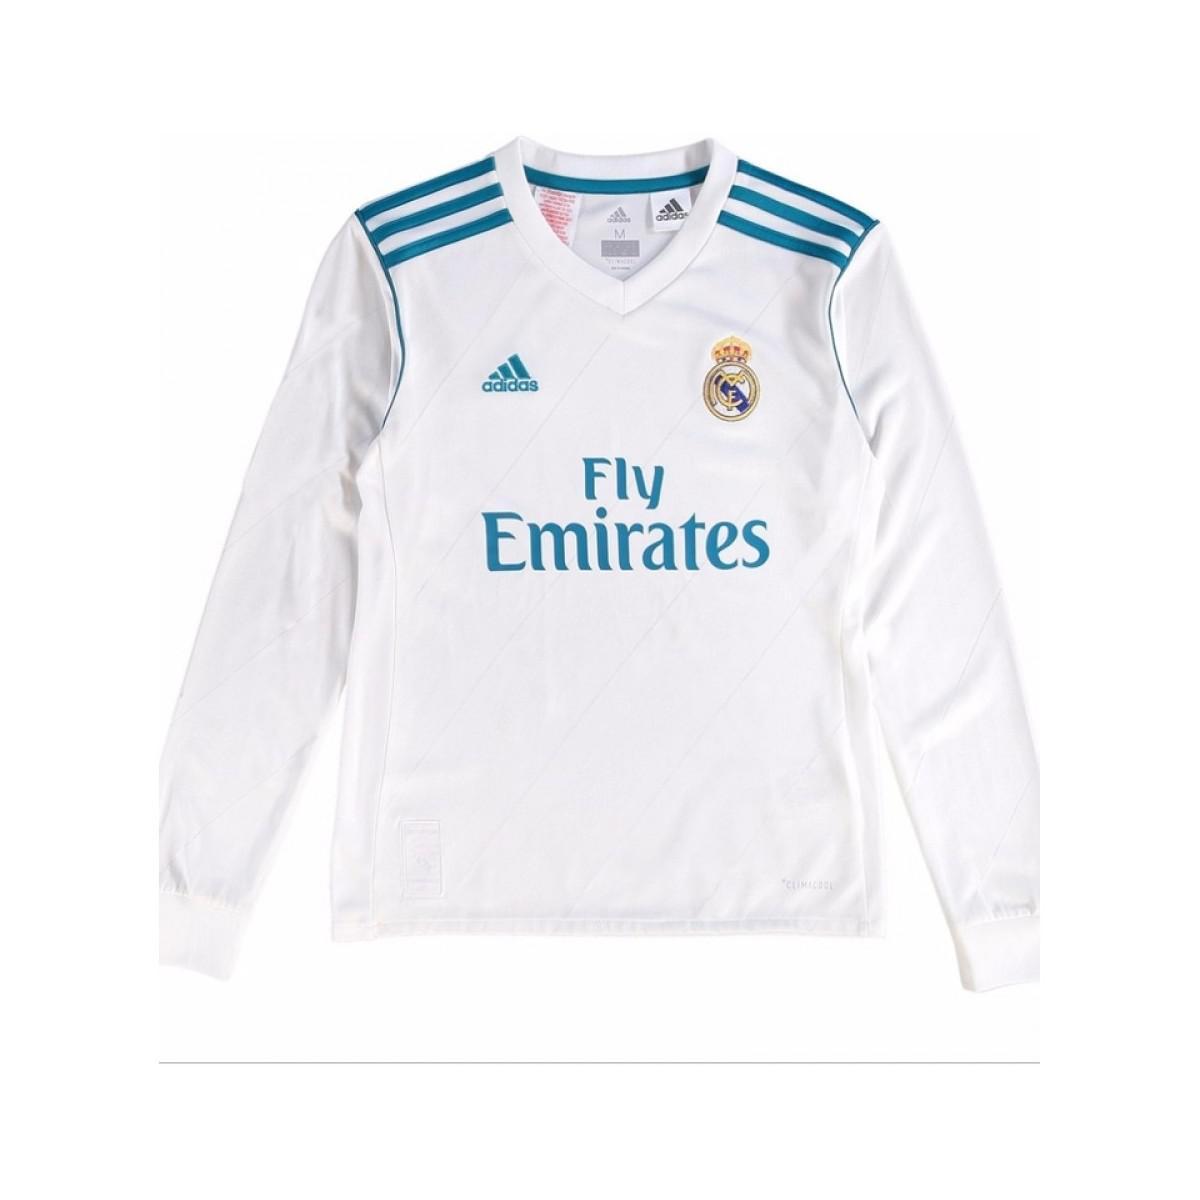 new product 6ba5a 2f234 Adidas - 2017-18 Real Madrid Long Sleeve Home Shirt - Kids (isco 22. View  fullscreen